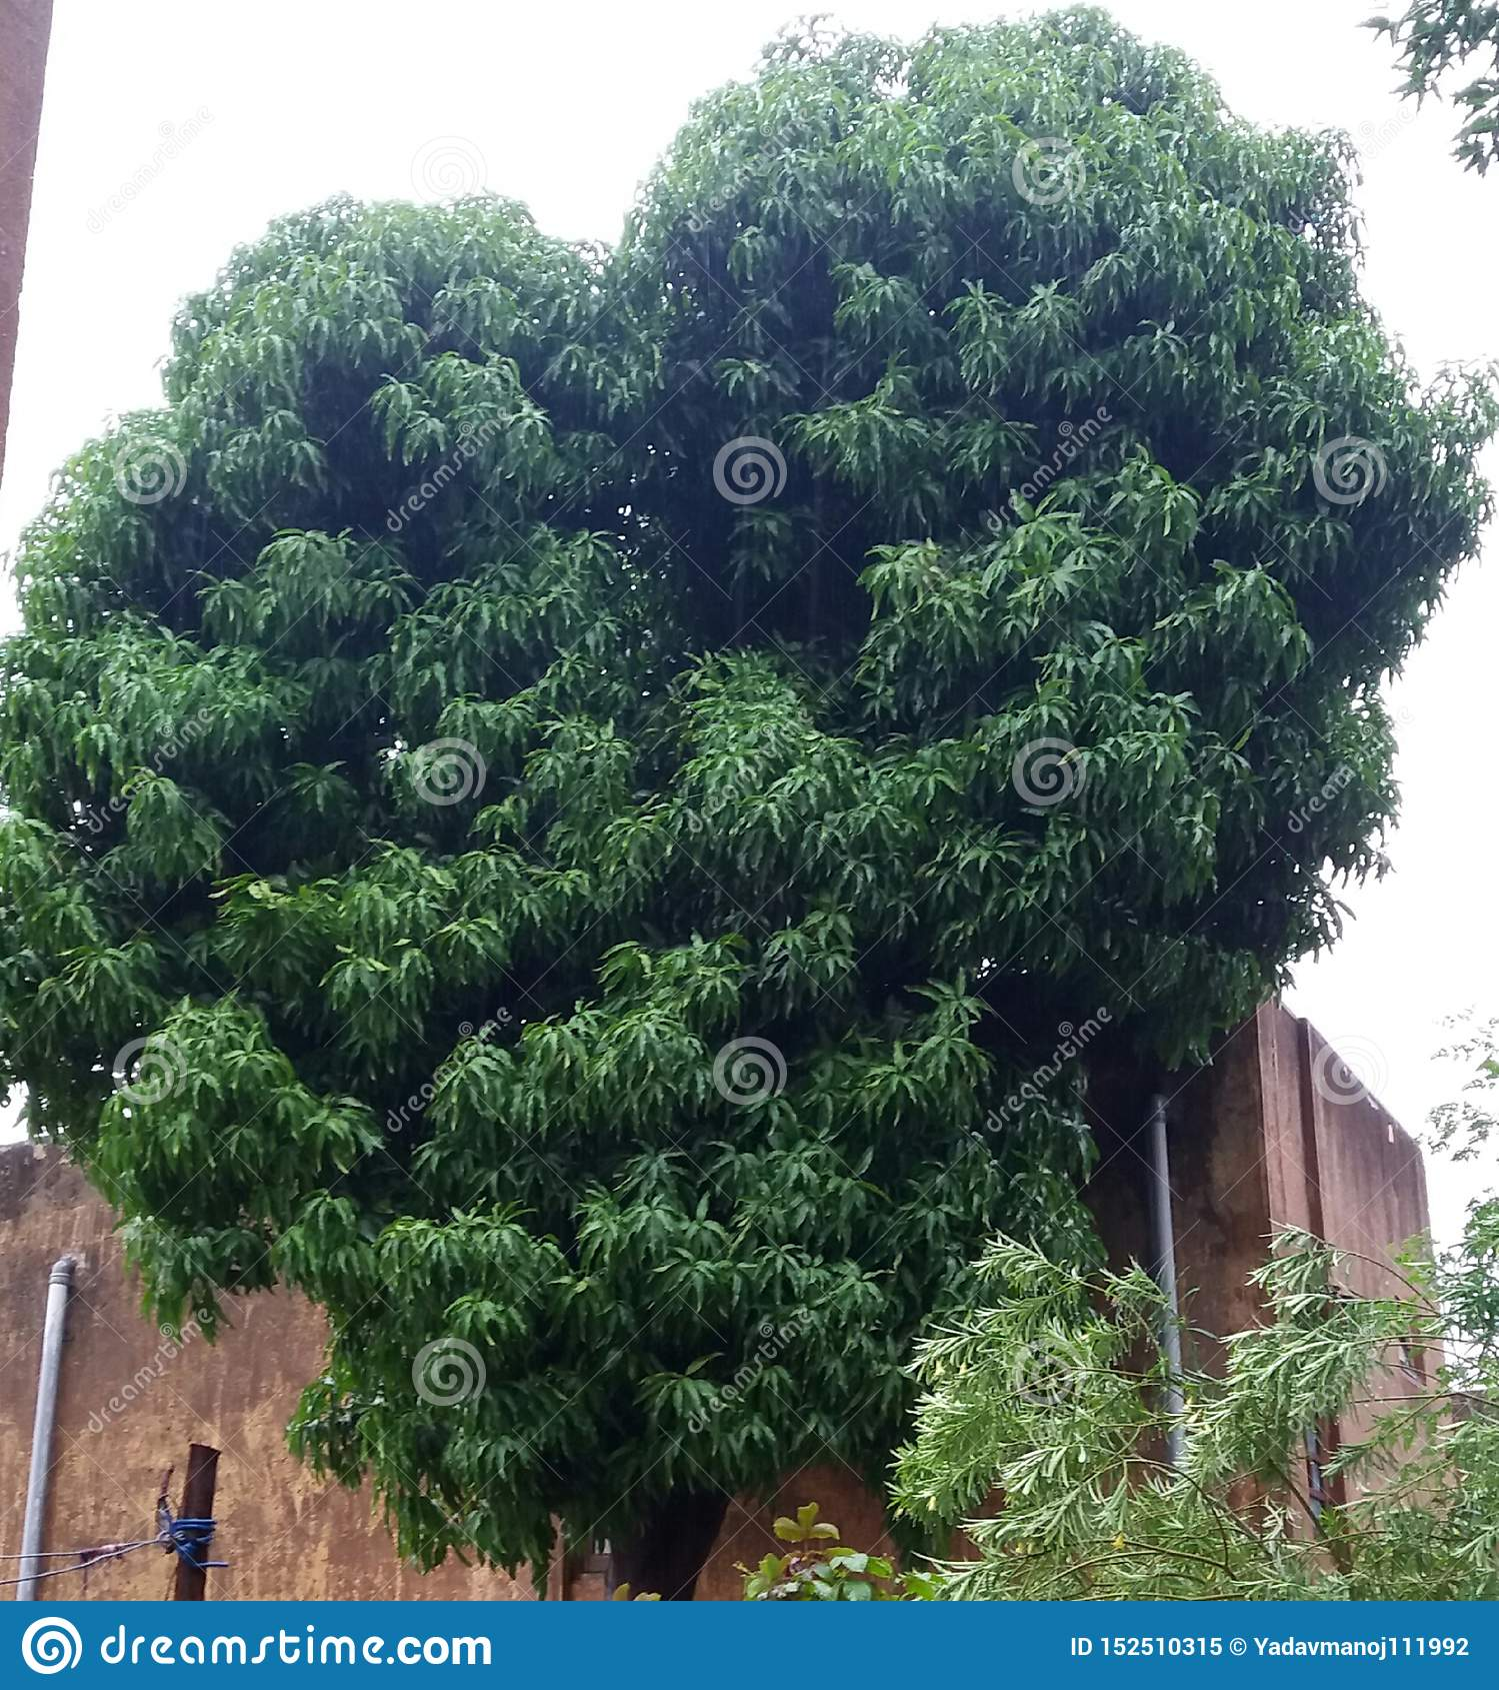 Natur drzewa i ro?liny